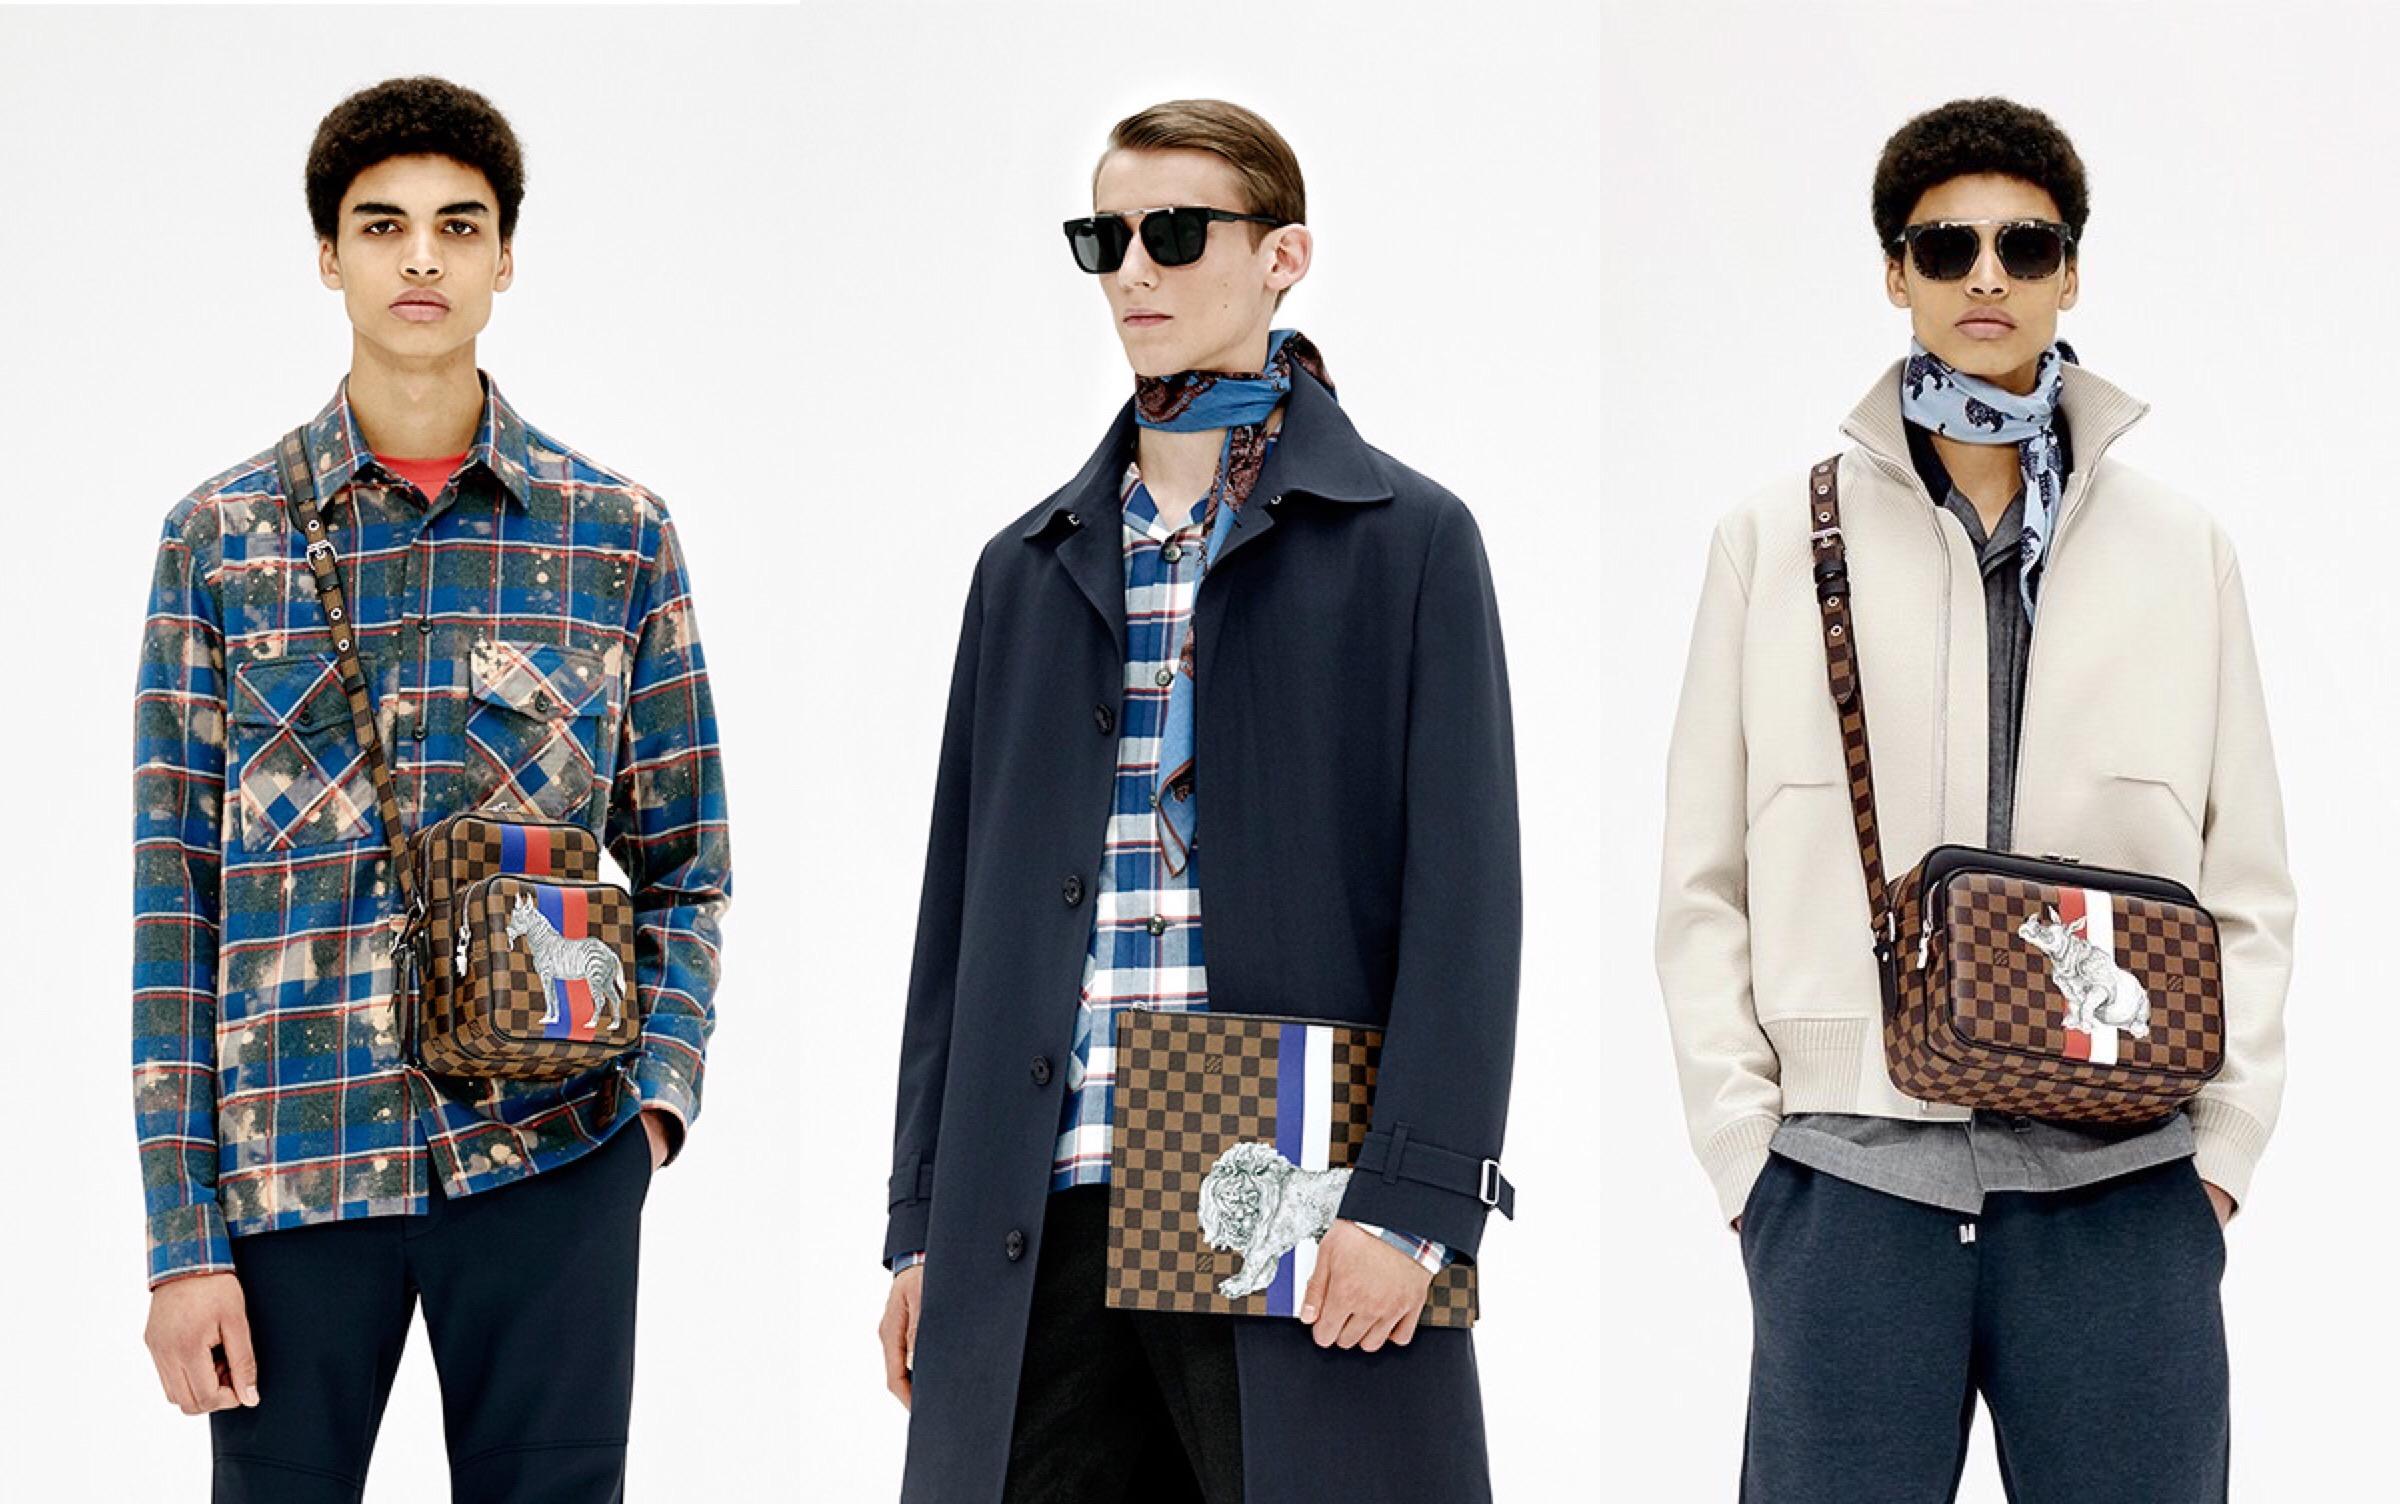 Louis Vuitton Pre-Spring 2017 Lookbook